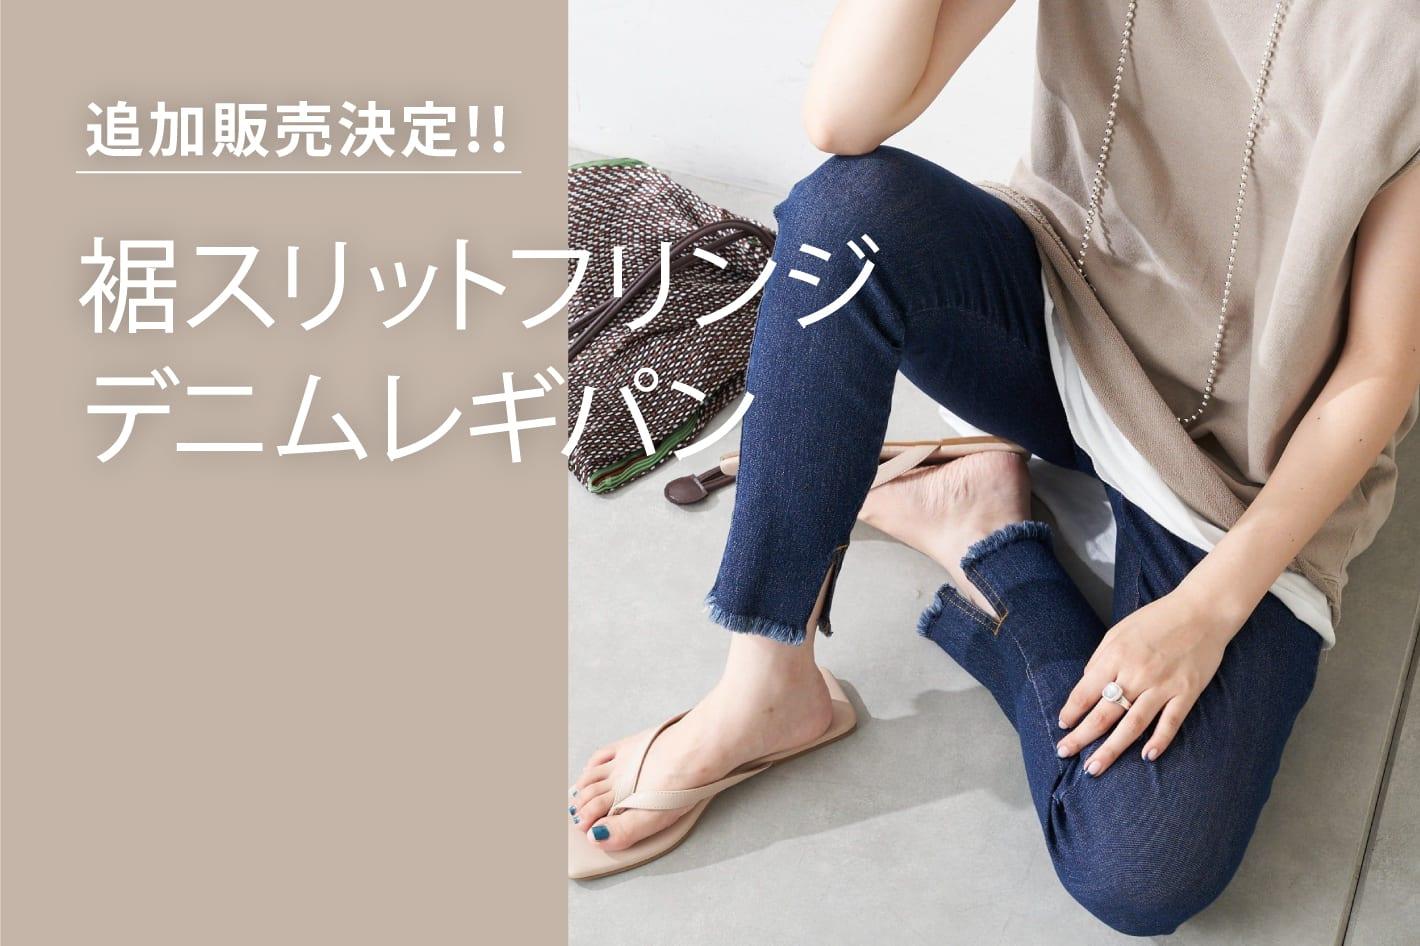 CIAOPANIC TYPY 【追加販売決定‼】裾スリットフリンジデニムレギパン